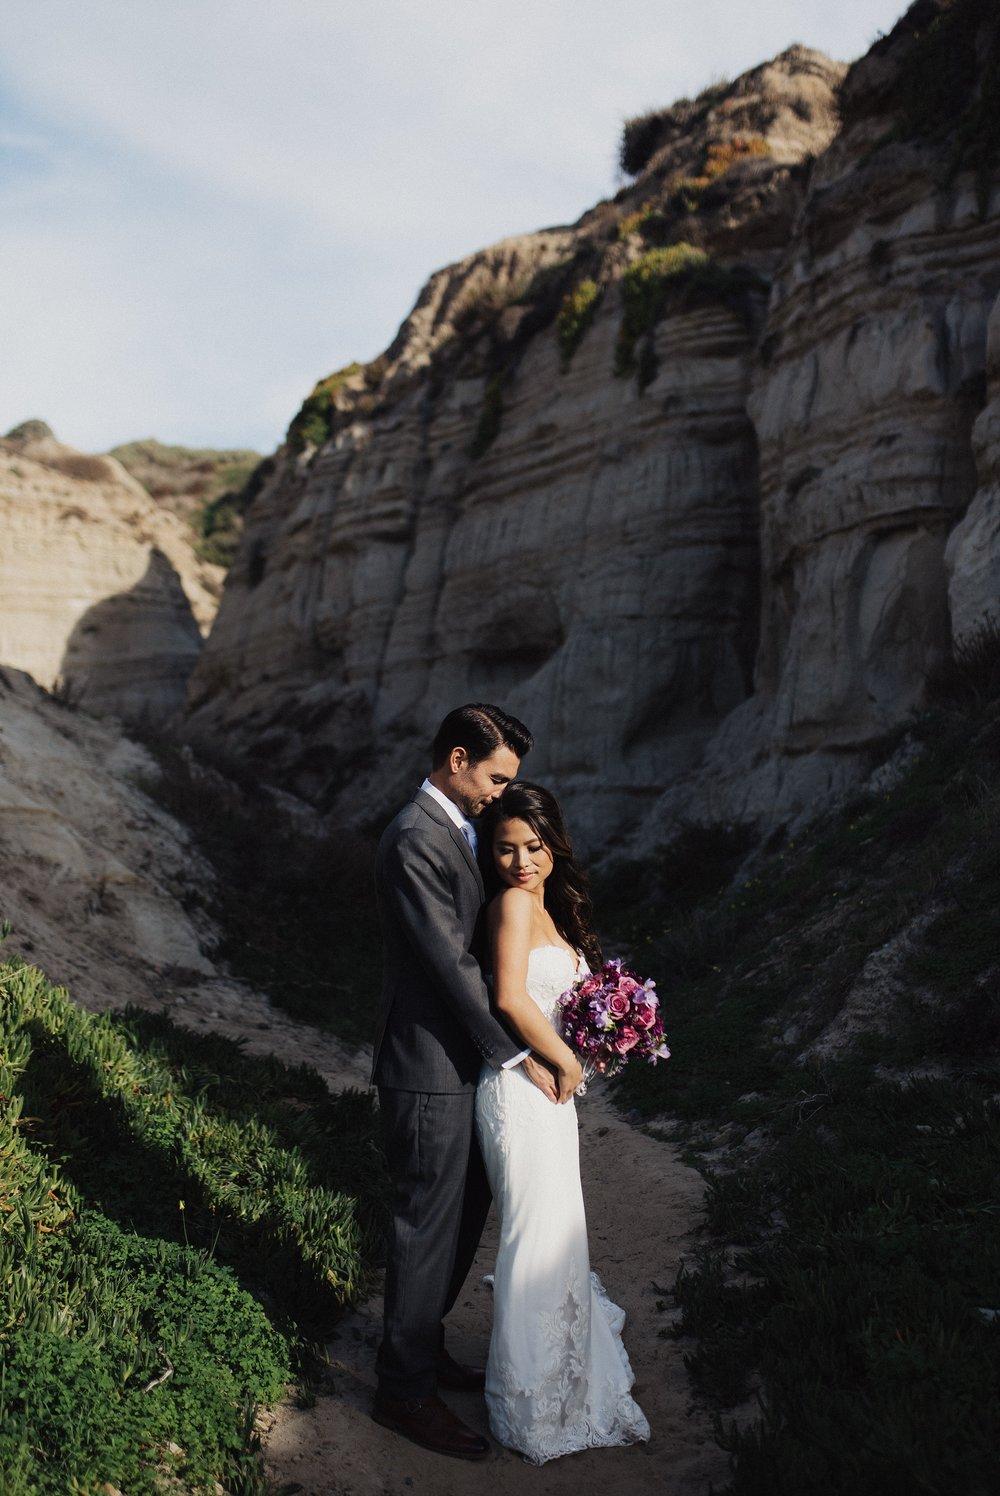 Badgley Mishka Wedding Dress